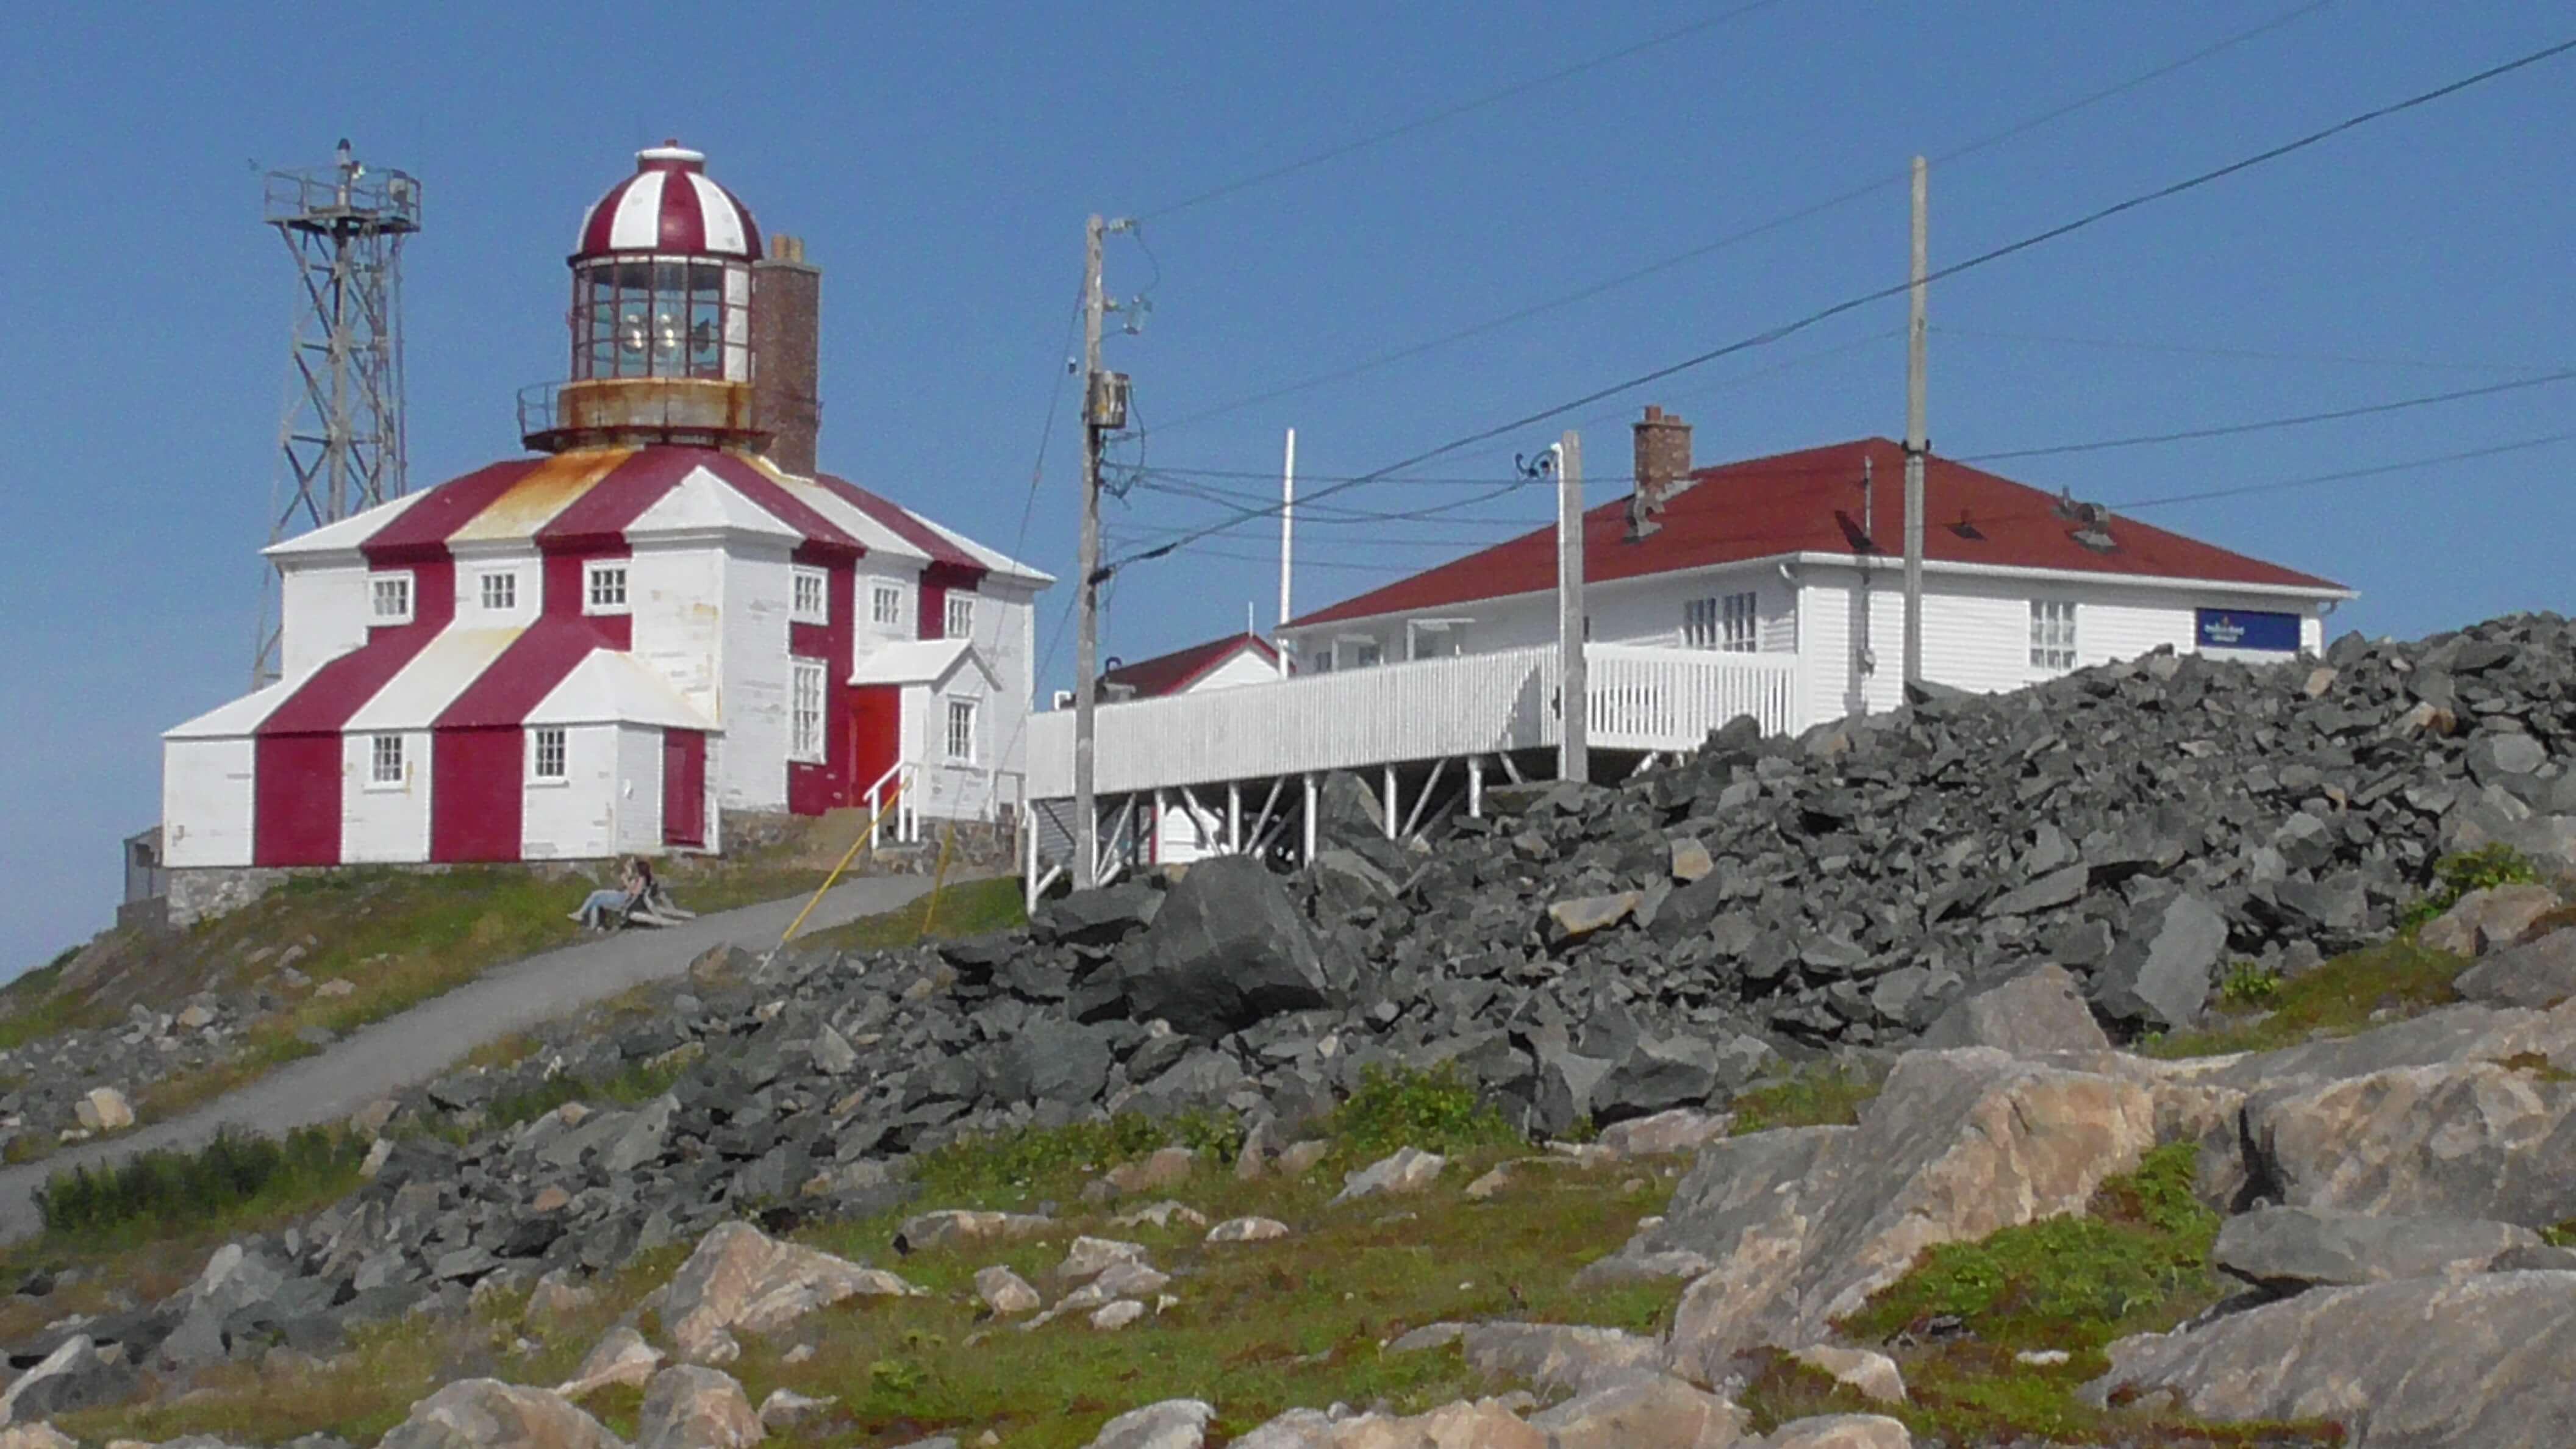 Cape Bonavista Lighthouse, Bonavista, Newfoundland